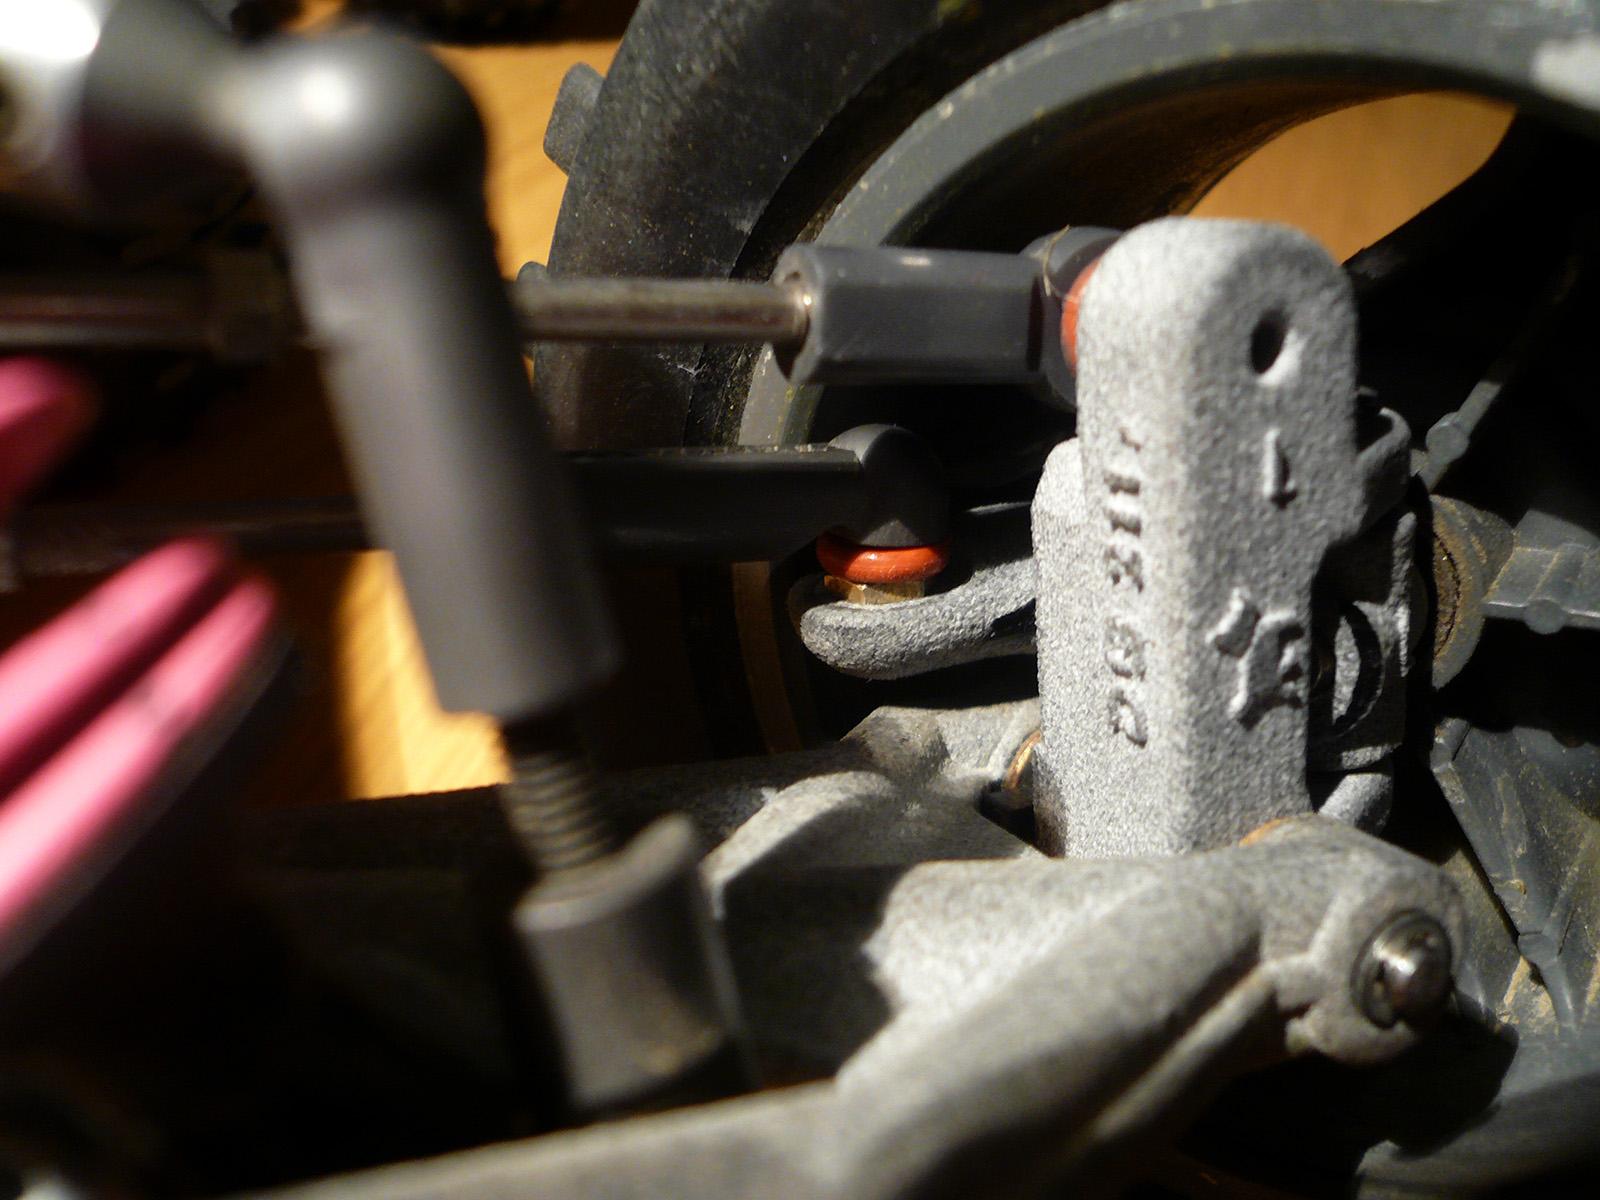 tamiya wrenchdog dyna blaster conversion h1 h2 c-hub